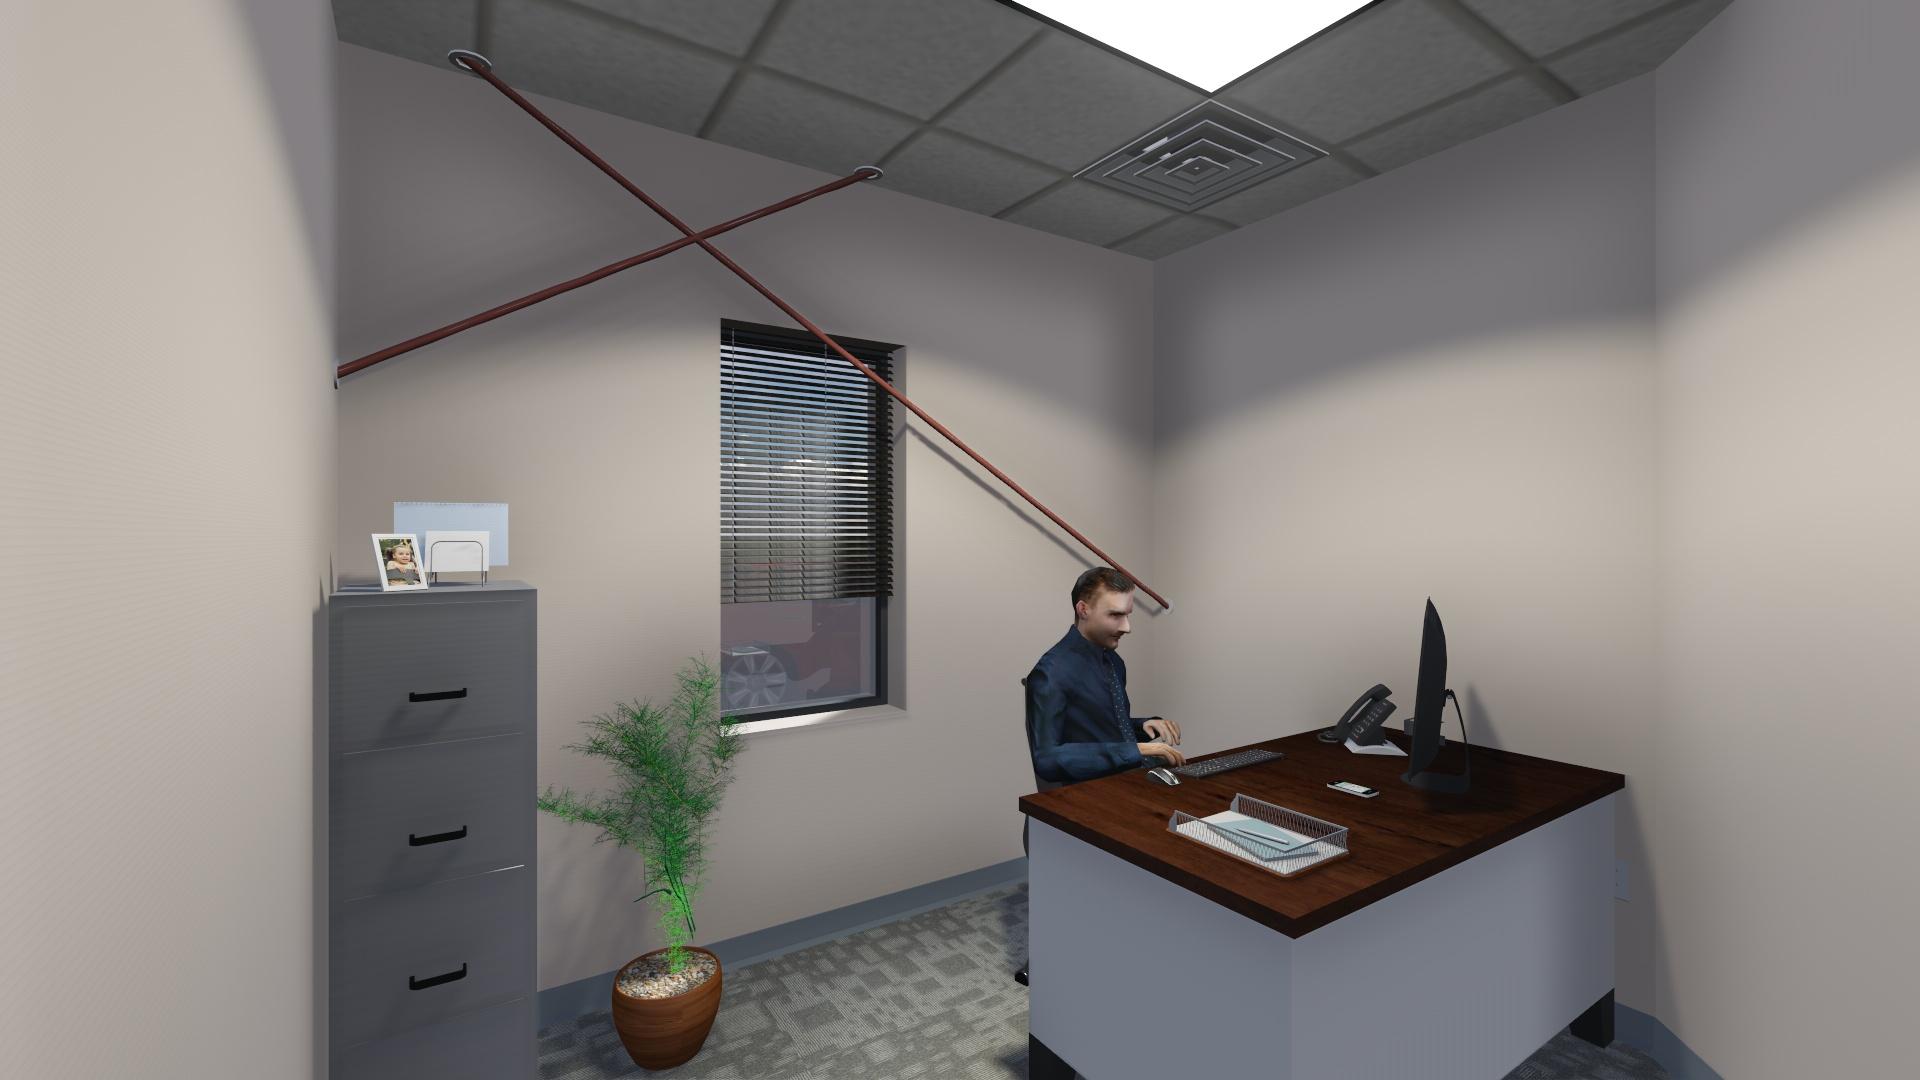 27 MAR 14 - OFFICE RENDERING - OFFICE.jpg